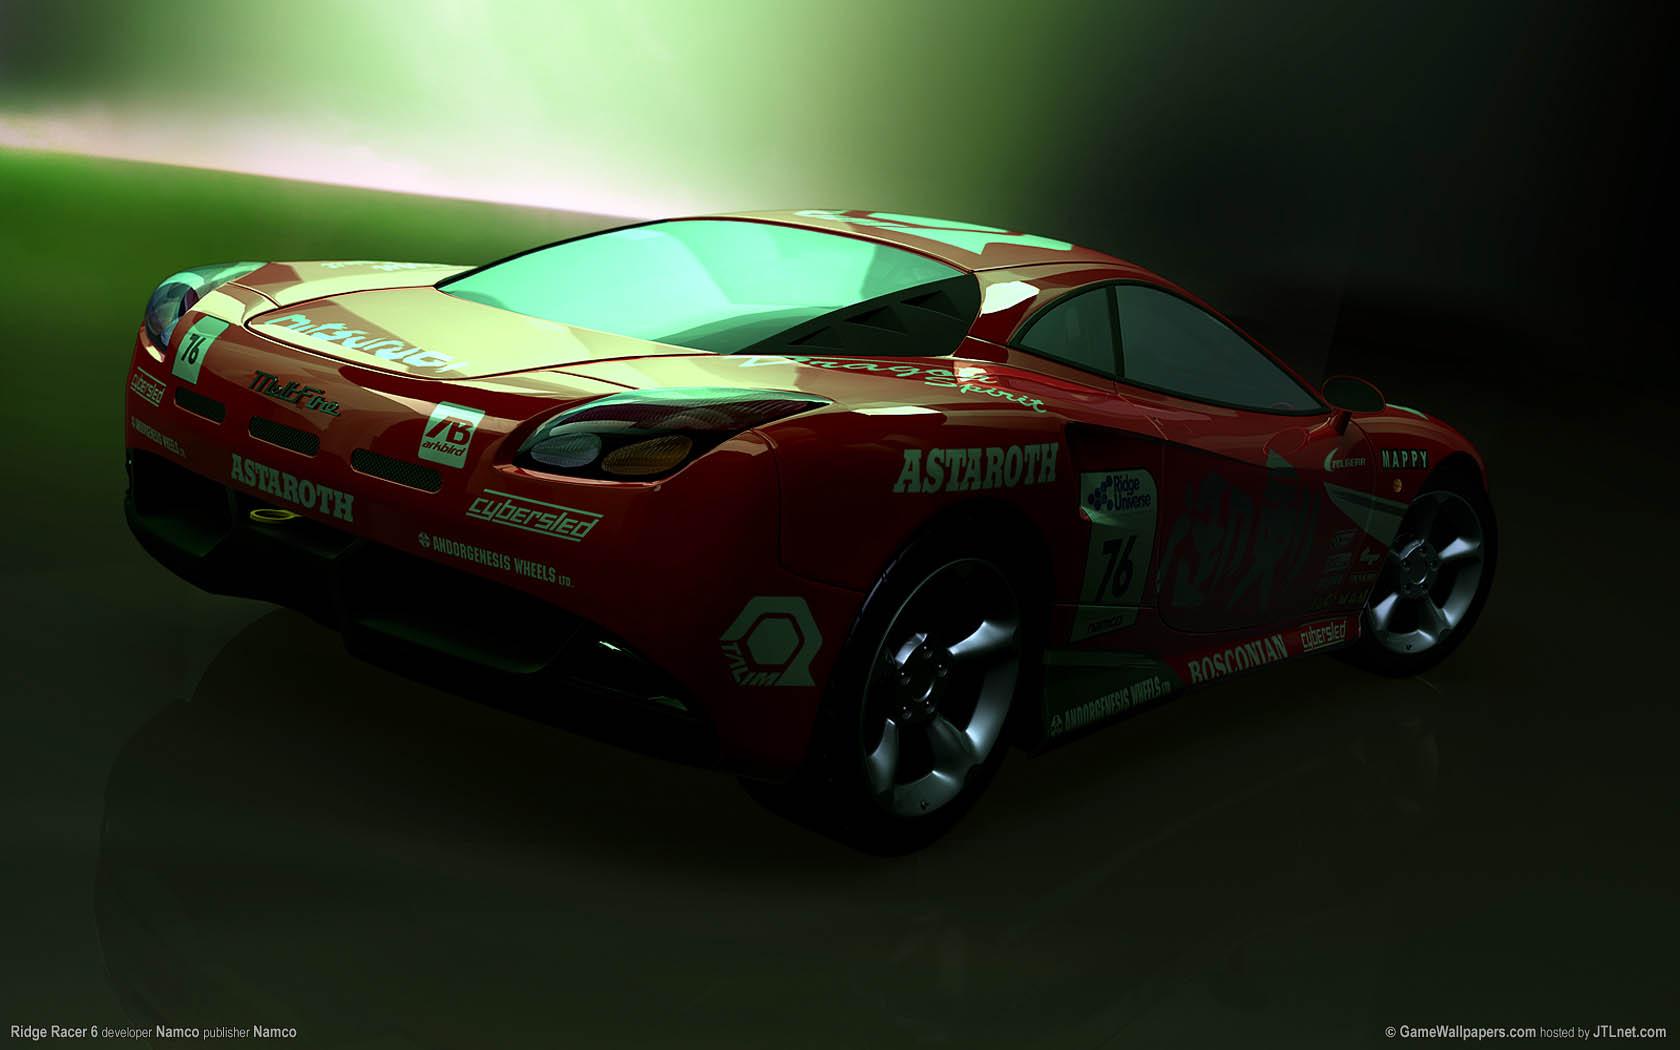 Ridge Racer 6 Hintergrundbild 03 1680x1050